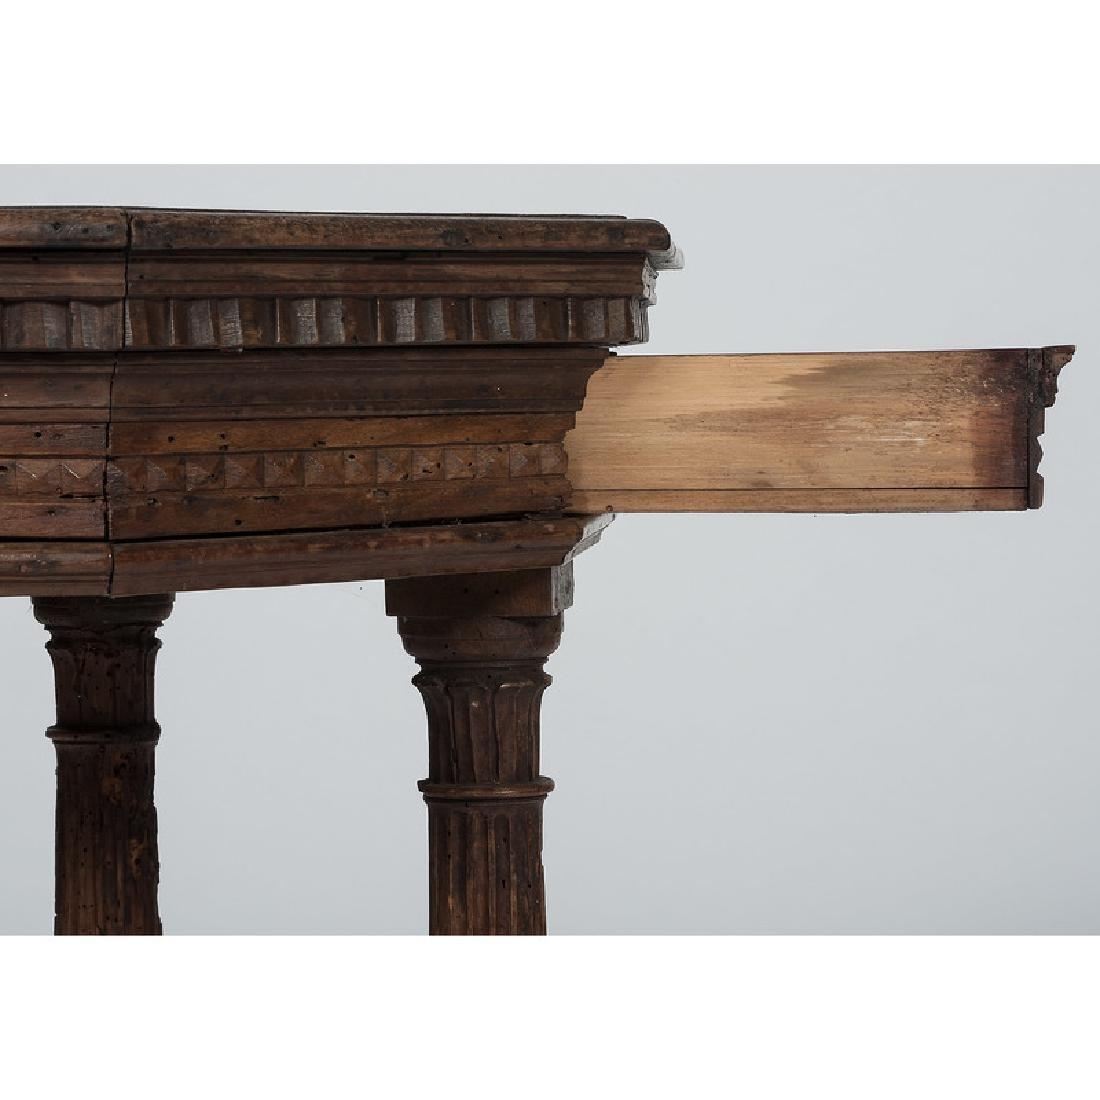 Italian Renaissance-style Octagonal Side Table - 3